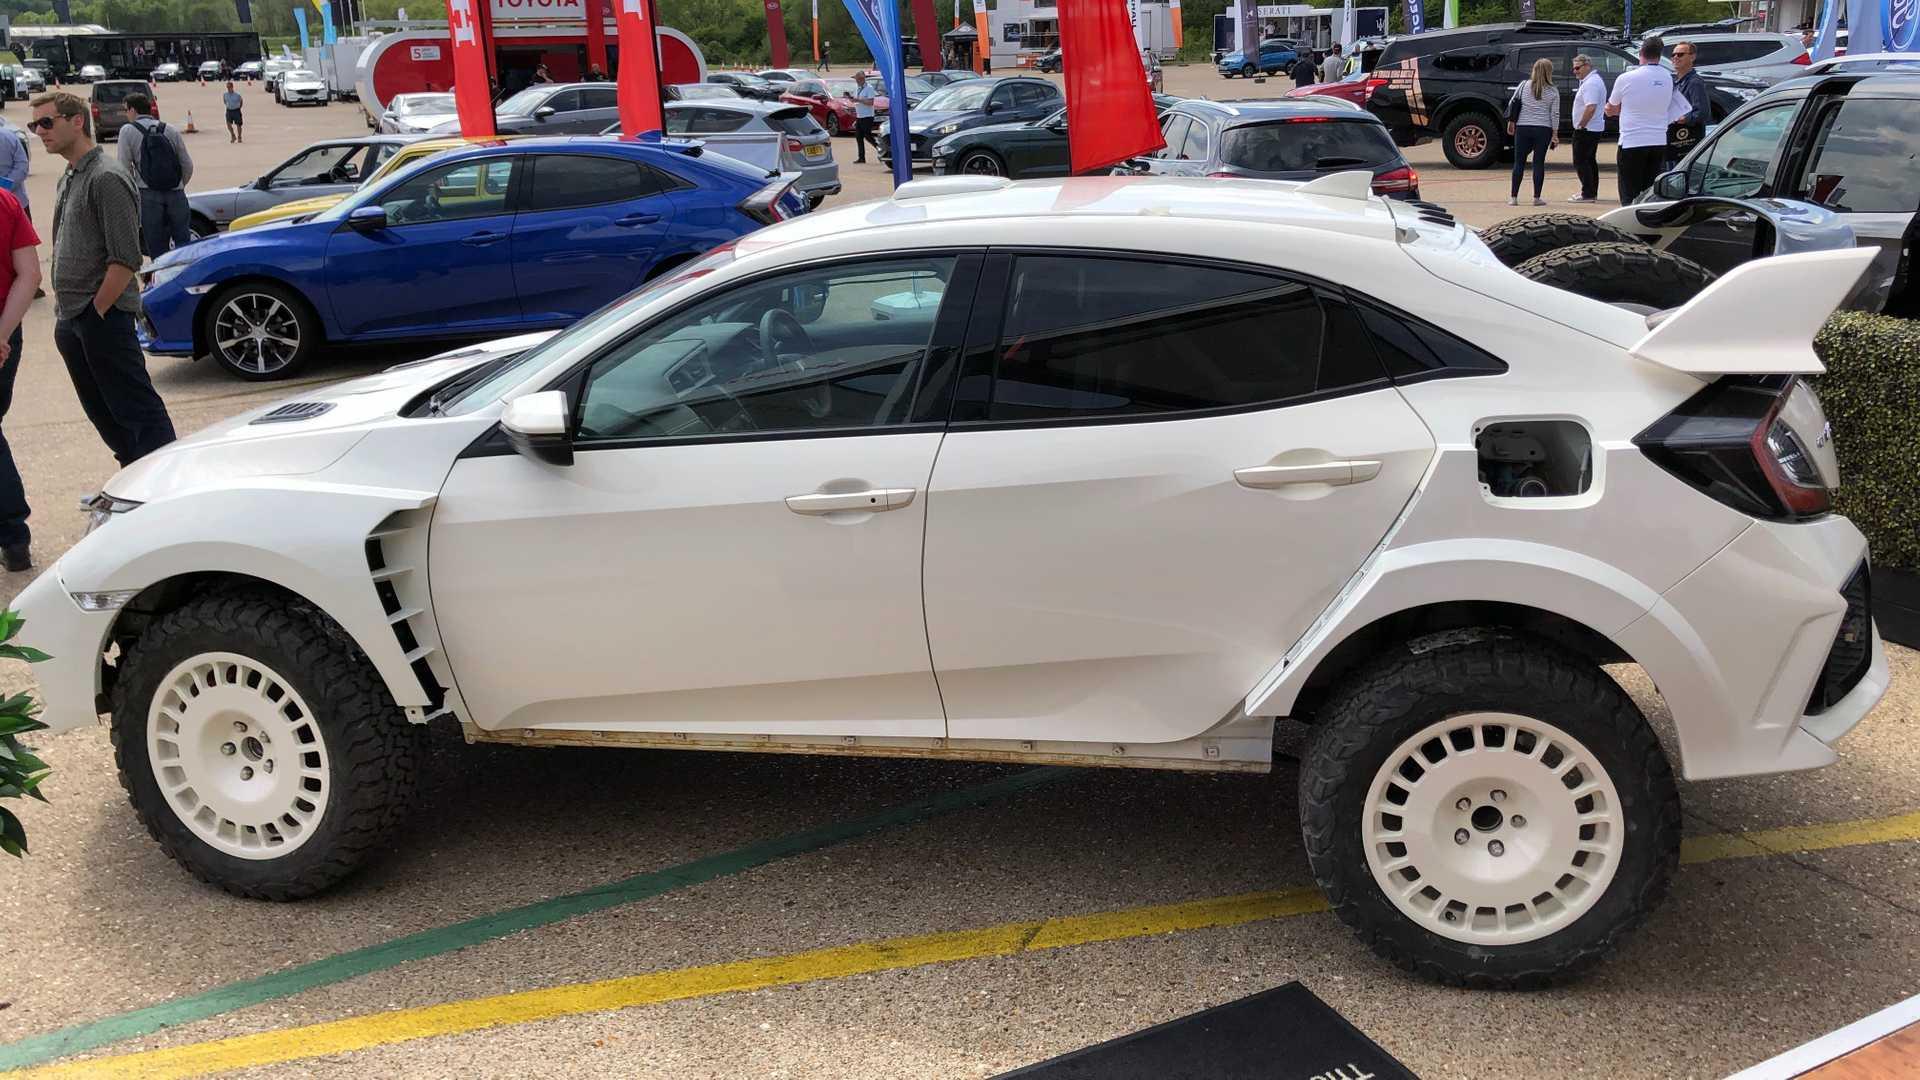 Honda-Civic-Type-R-rally-car-3